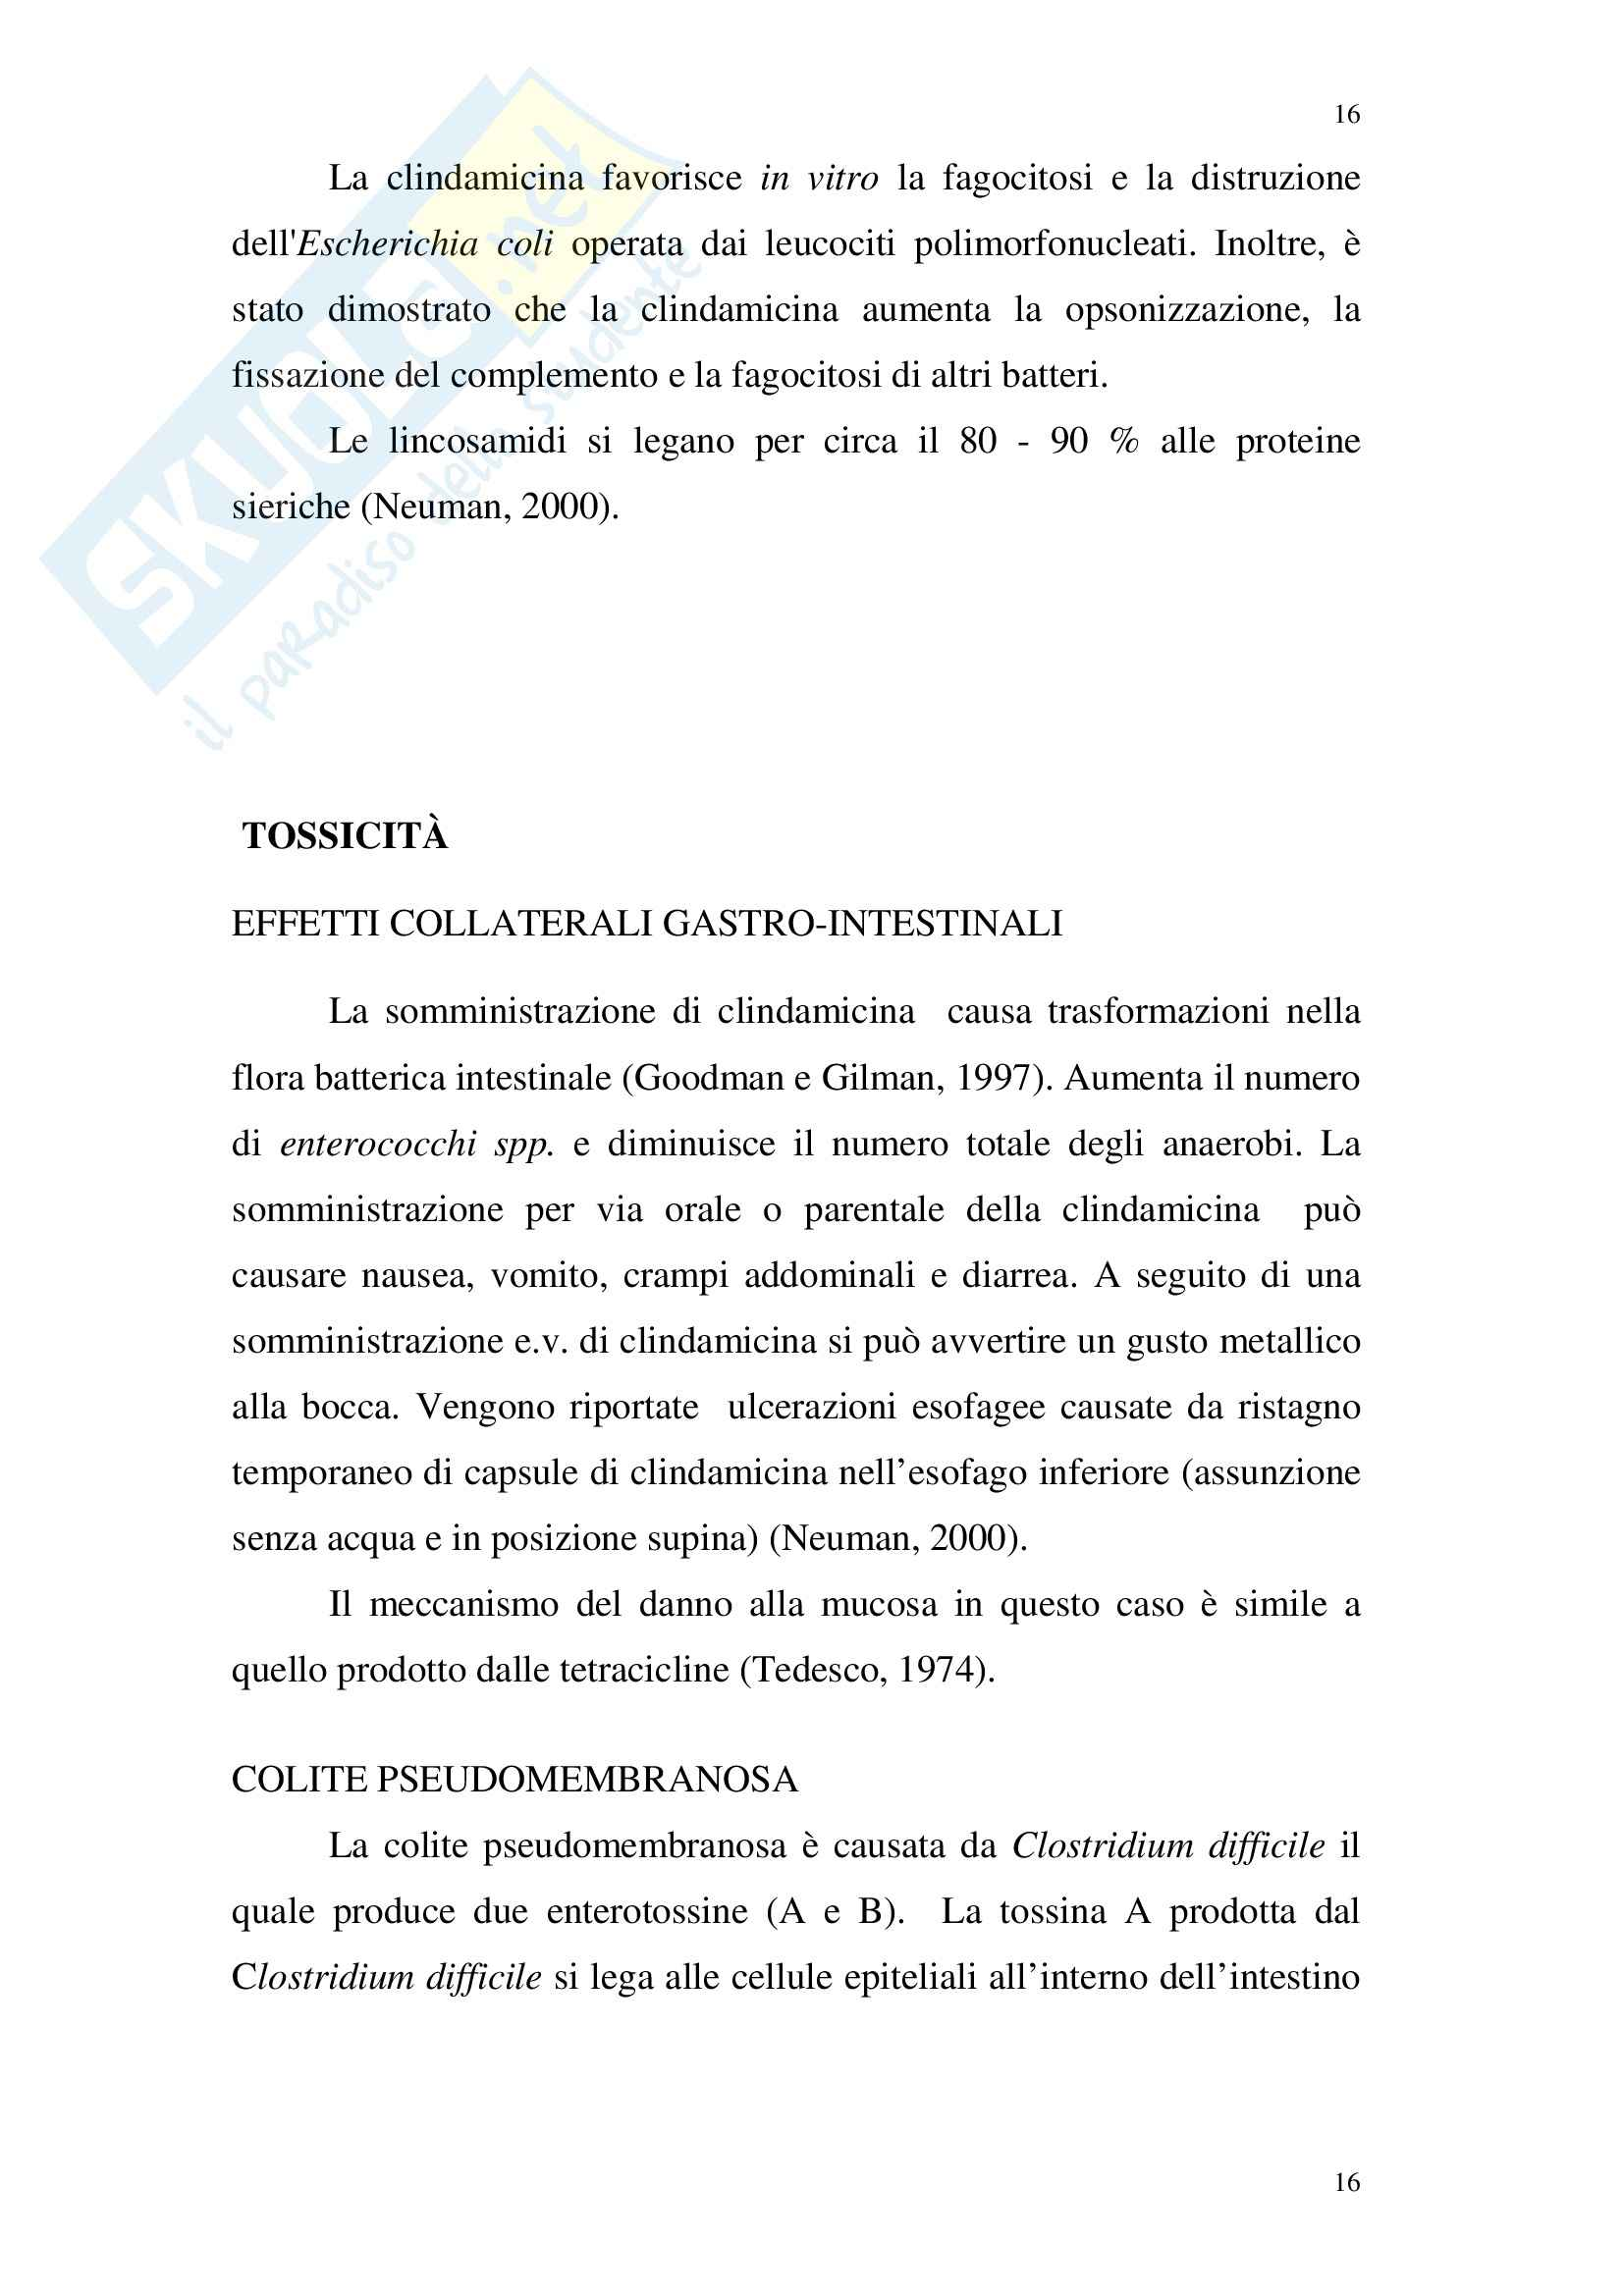 Chimica farmaceutica - lincosamidi Pag. 16